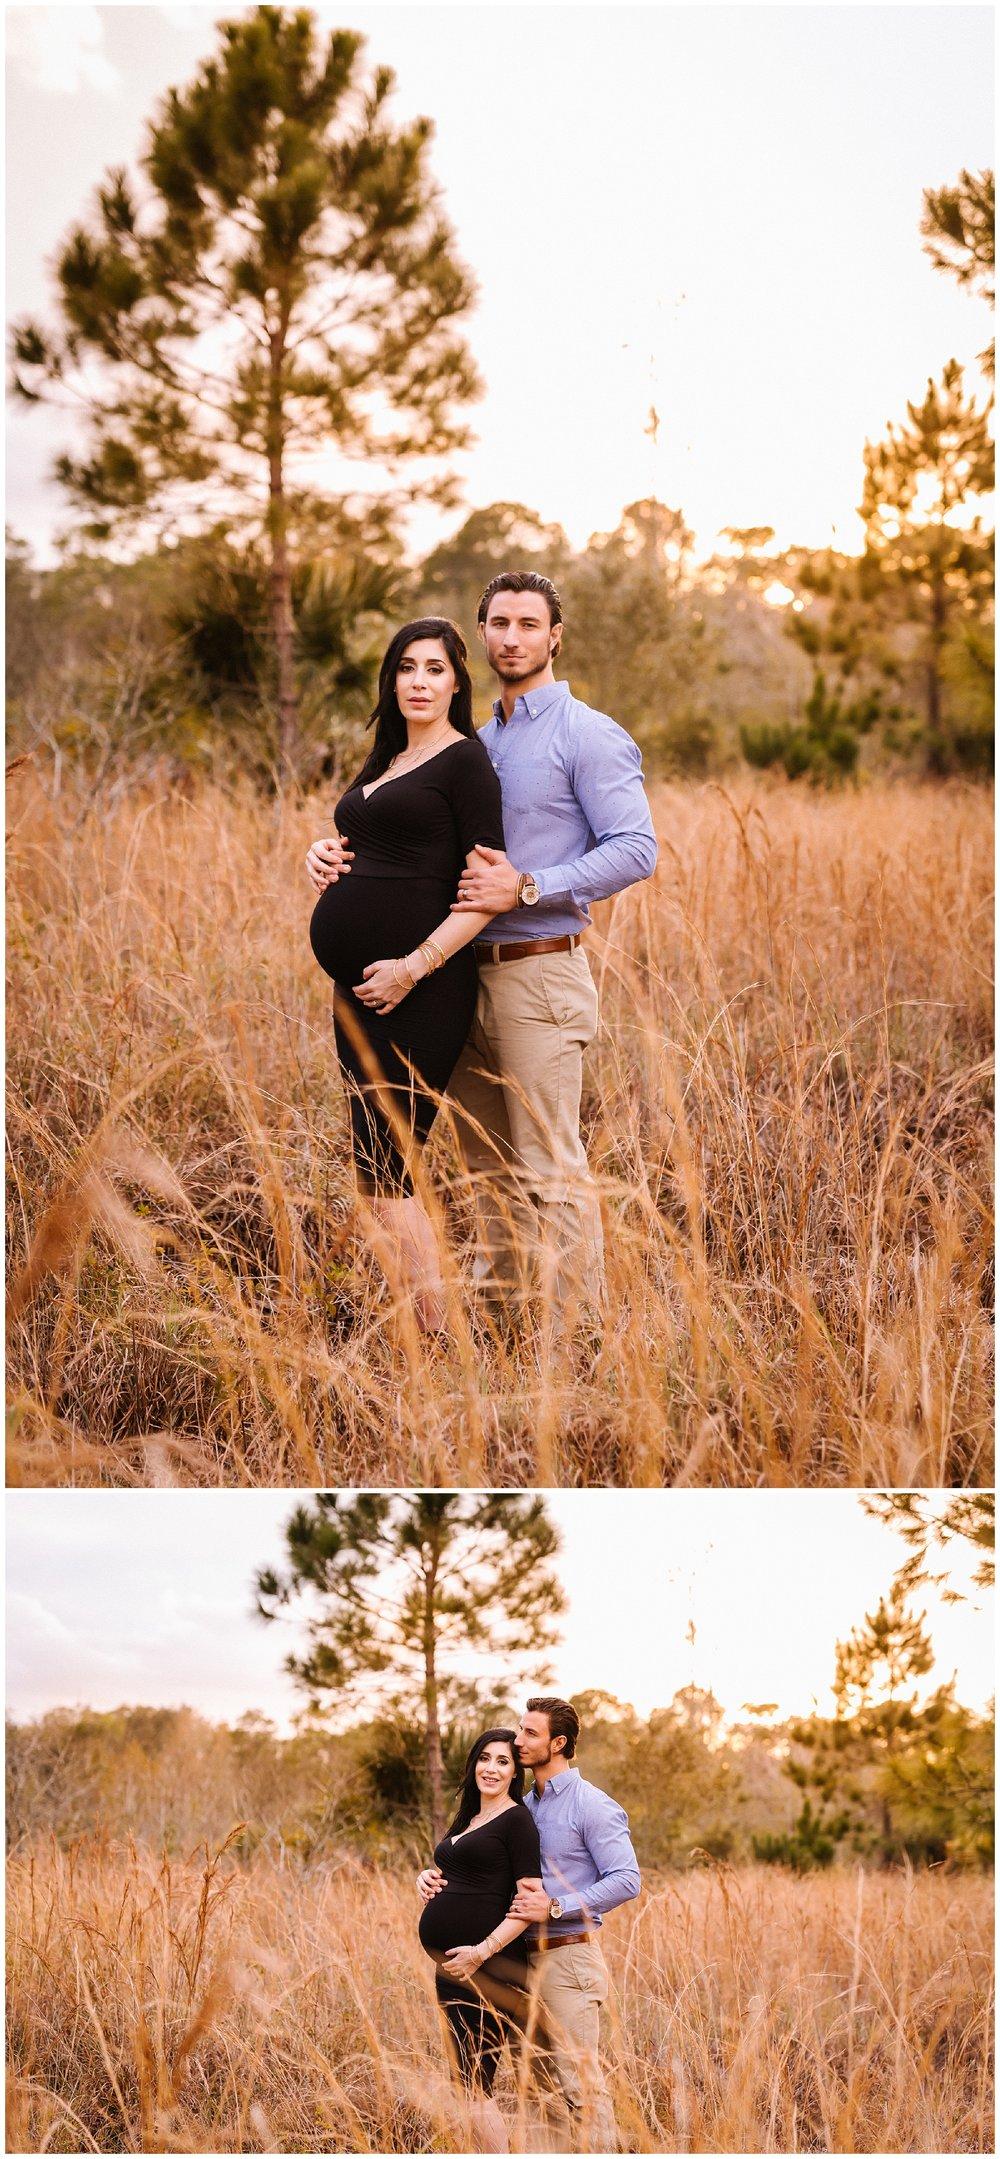 Tampa-maternity-photographer-morris-bridge-park-hip-tight-black-dress-woods_0019.jpg